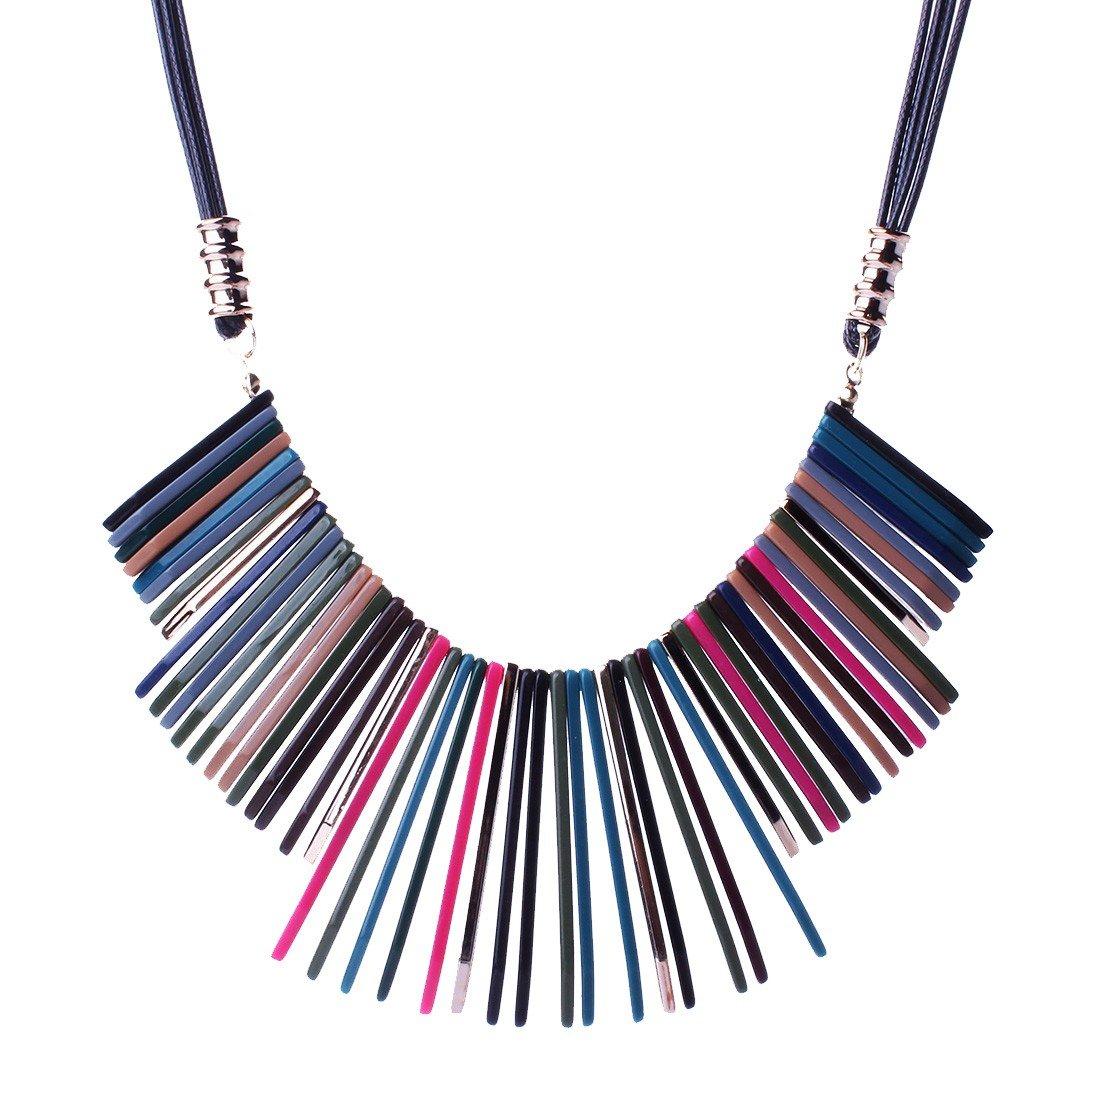 Qiyun Colorful Rainbow Stick Dangle Charm Leather Rope Cord Bib Pendant Necklace Colore Arc Baton Cuir Charme Corde Cordon Collier W005N2261